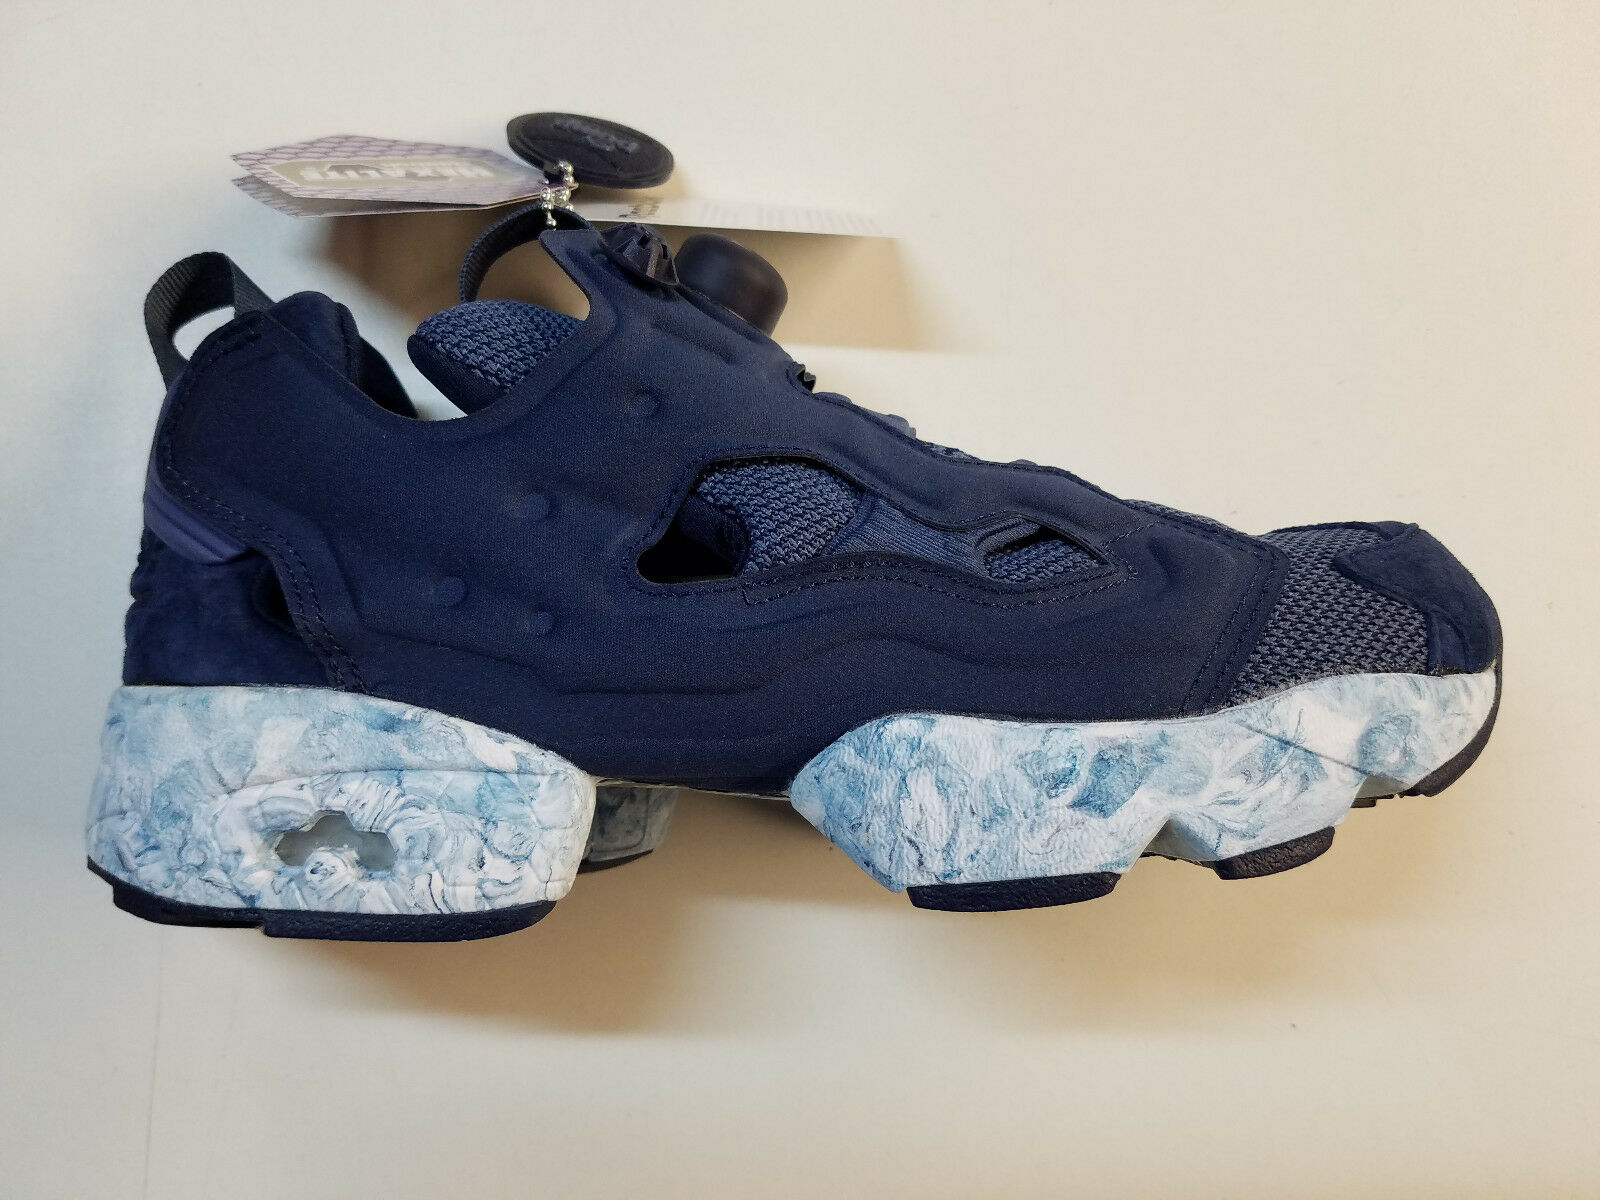 Reebok Instapump Fury Achm Navy Marble White Retro Mens Sneakers BD1551 1801-10